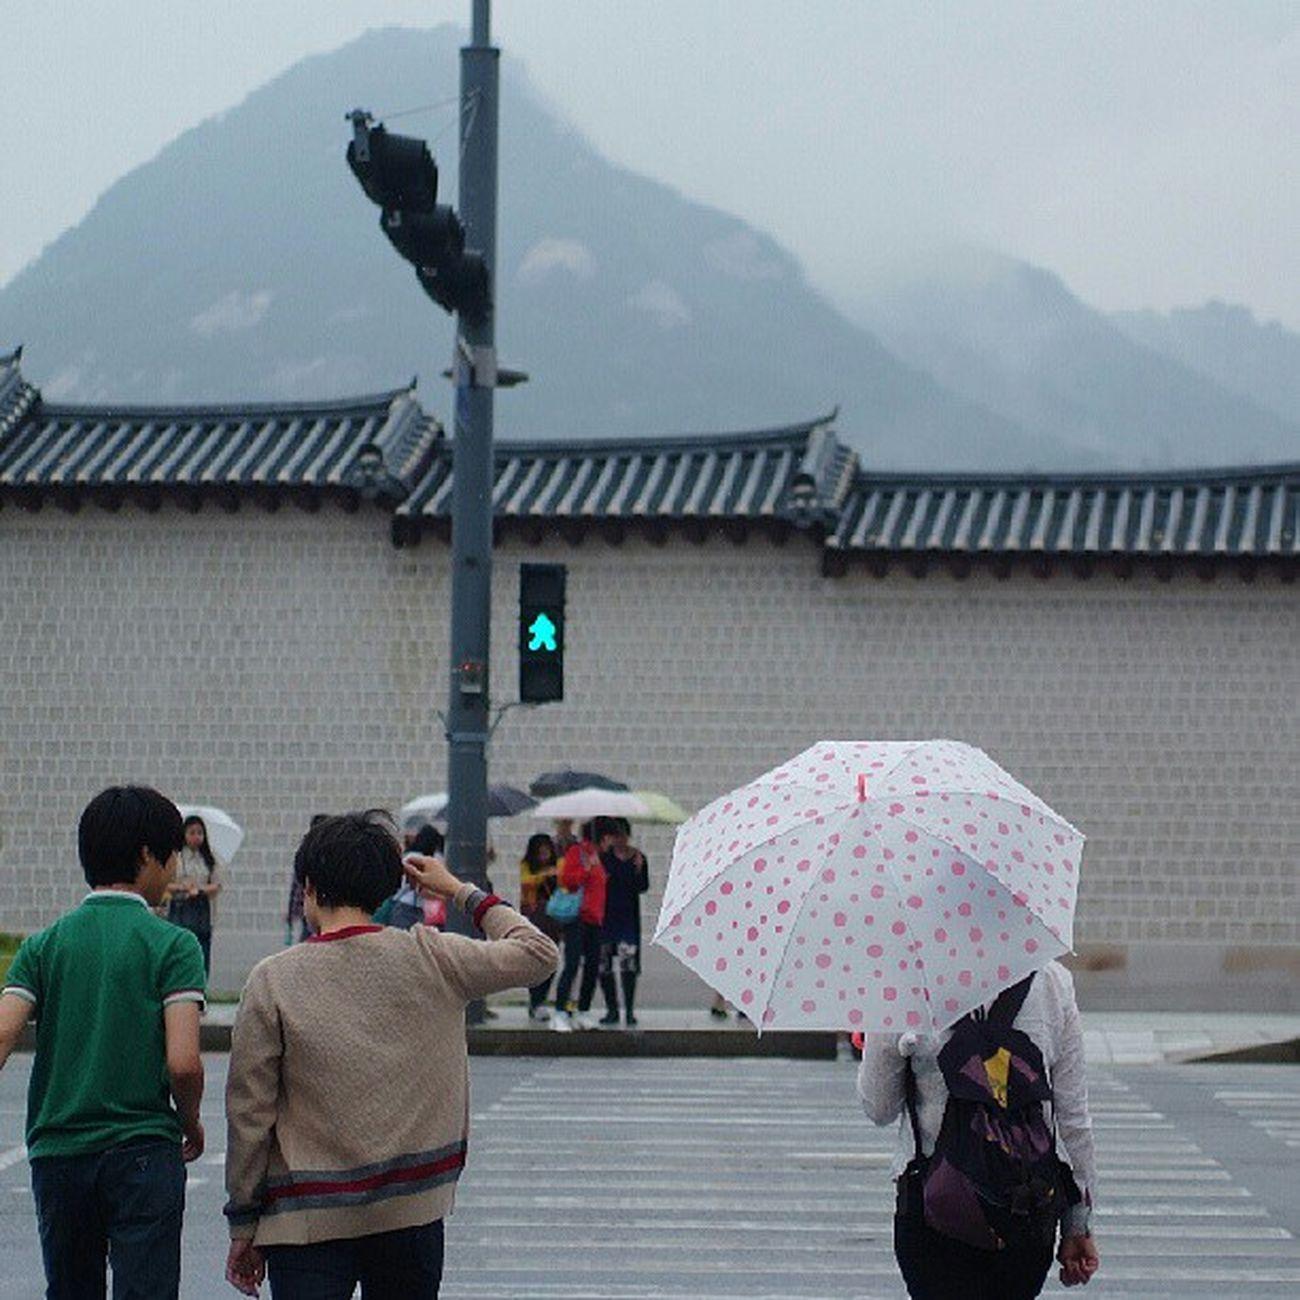 Robin_theme15 City of rain 올랑말랑해 광화문